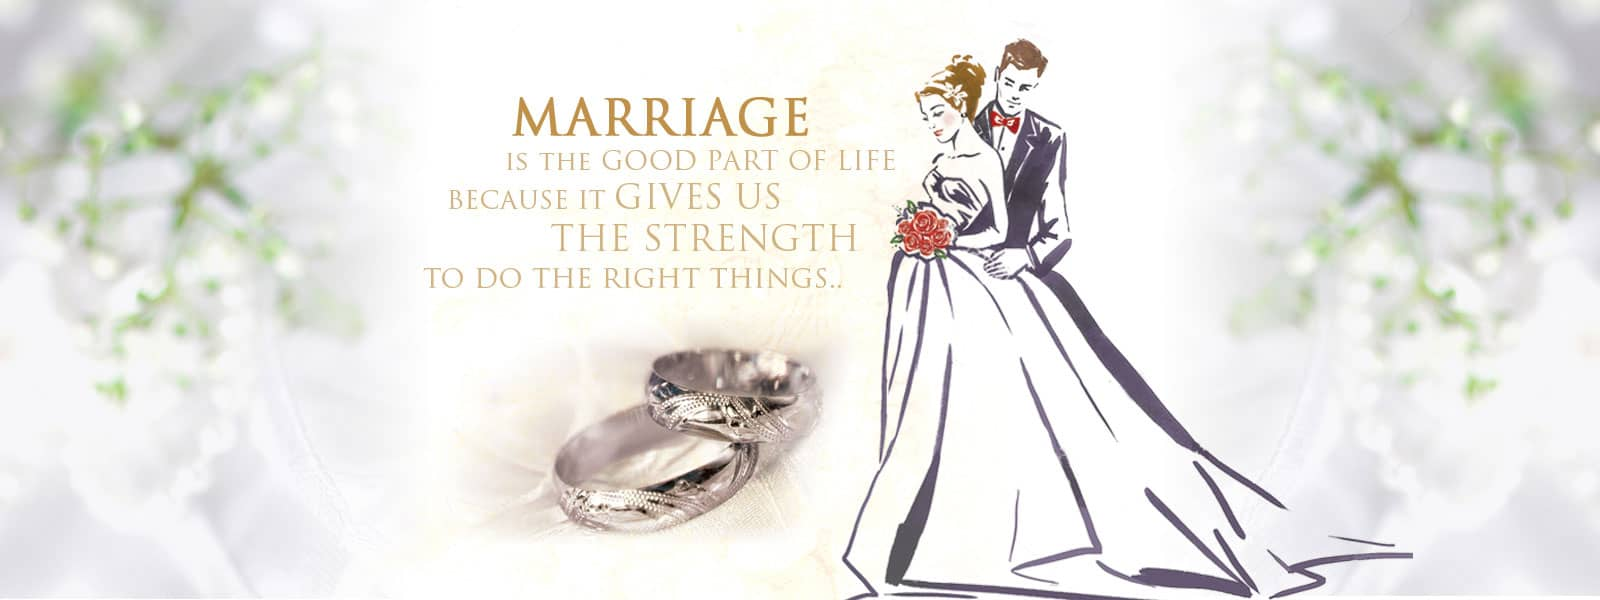 Best Marriage Bureau in Delhi NCR India, Best Matrimonial